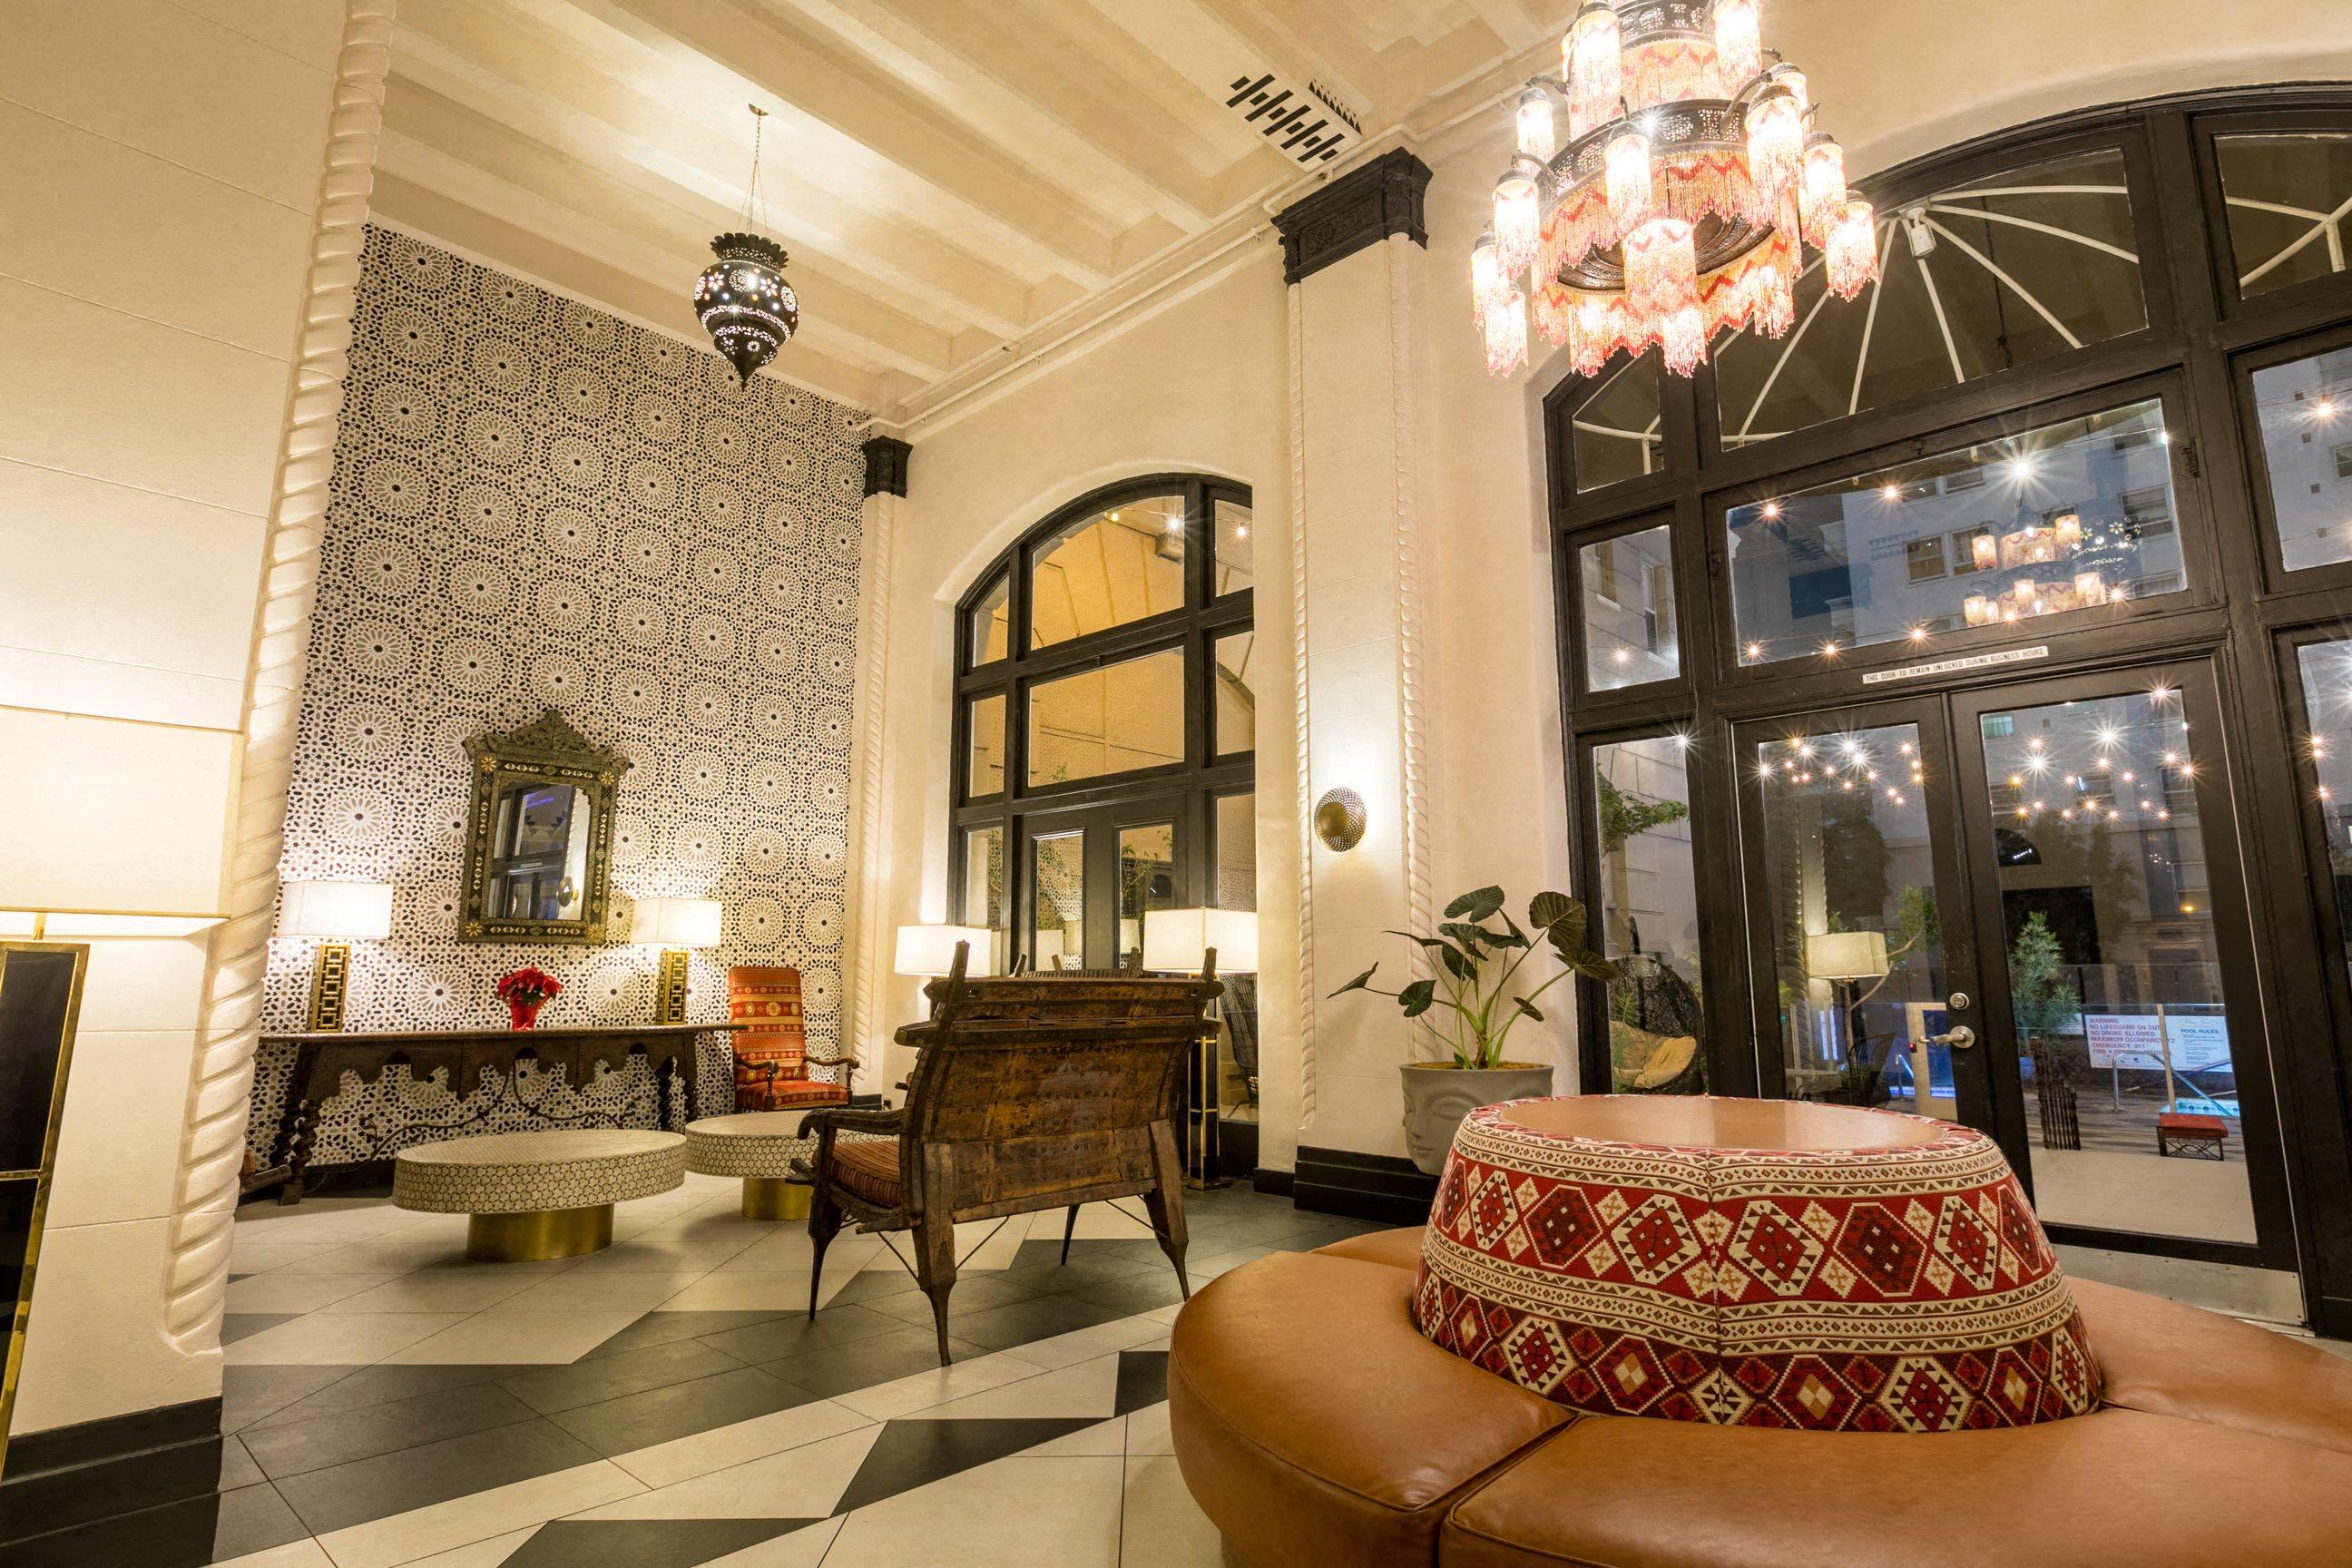 Lobby Photo at Night of Wilshire Royale Apartments, 2619 Wilshire Blvd, Los Angeles, CA 90057